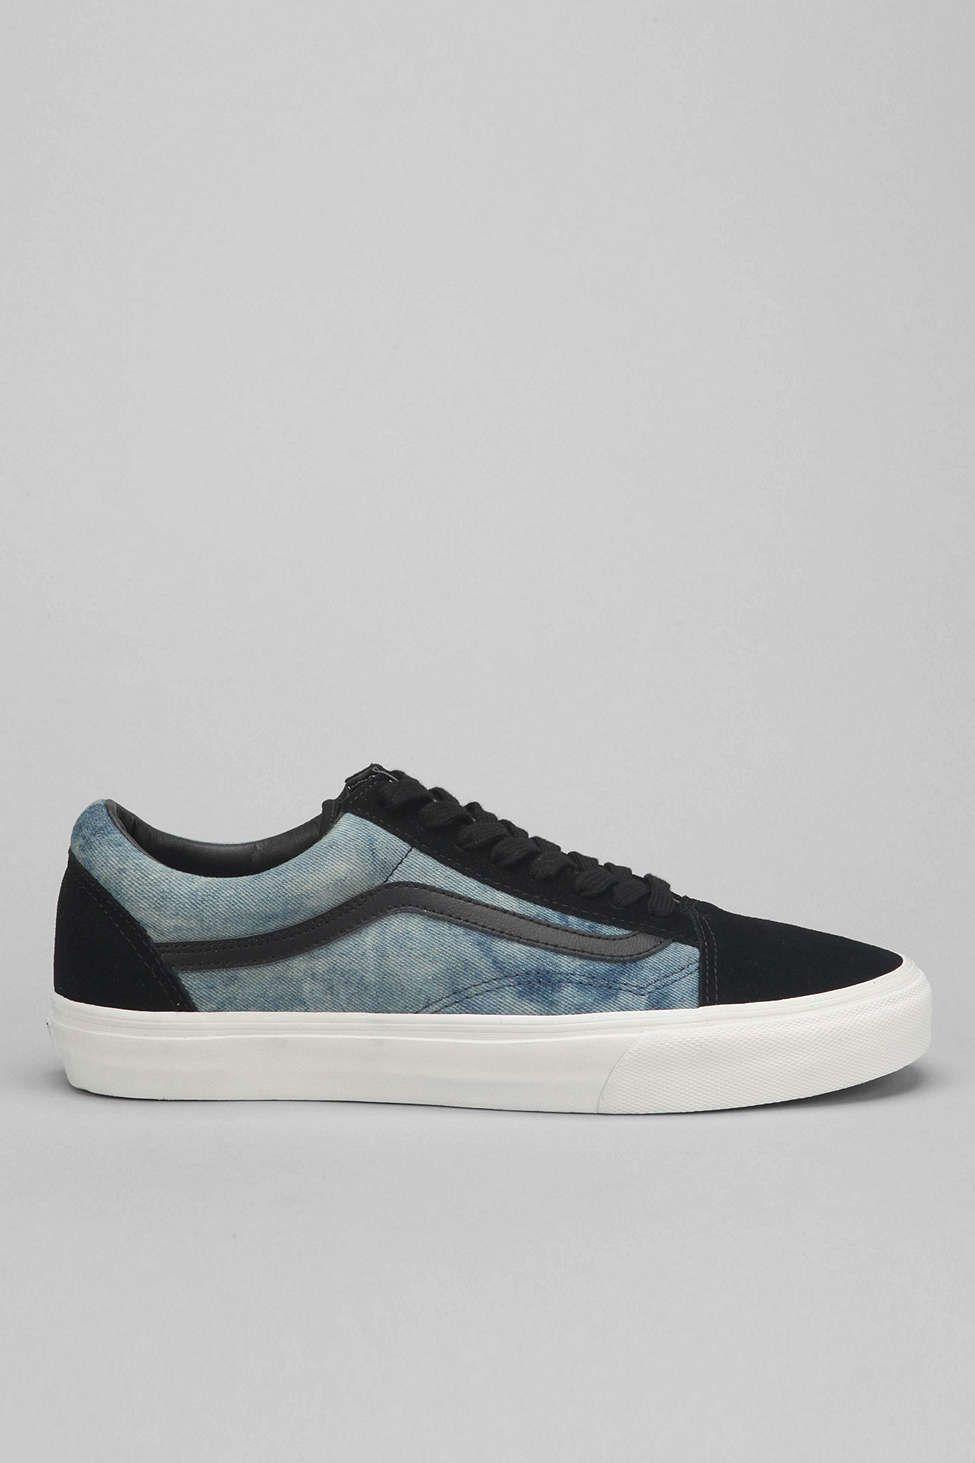 c3e19005324 Vans Old Skool Bleached Denim Men s Sneaker